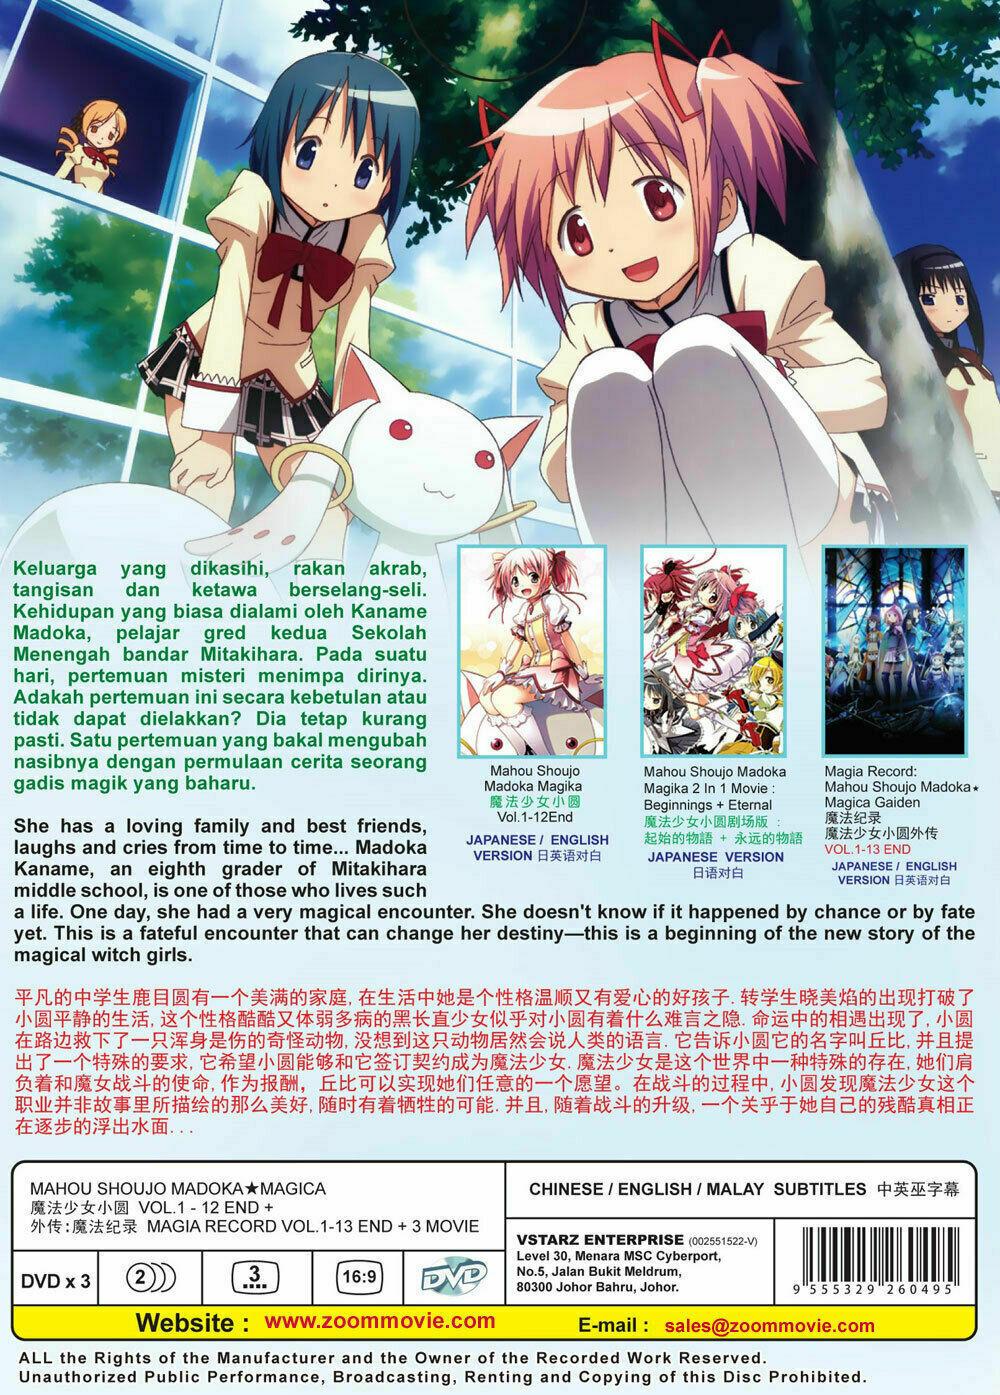 MAHOU SHOUJO MADOKA MAGICA 1-12+ MAGIA RECORD VOL.1-13 END ENG DUB + MOVIE